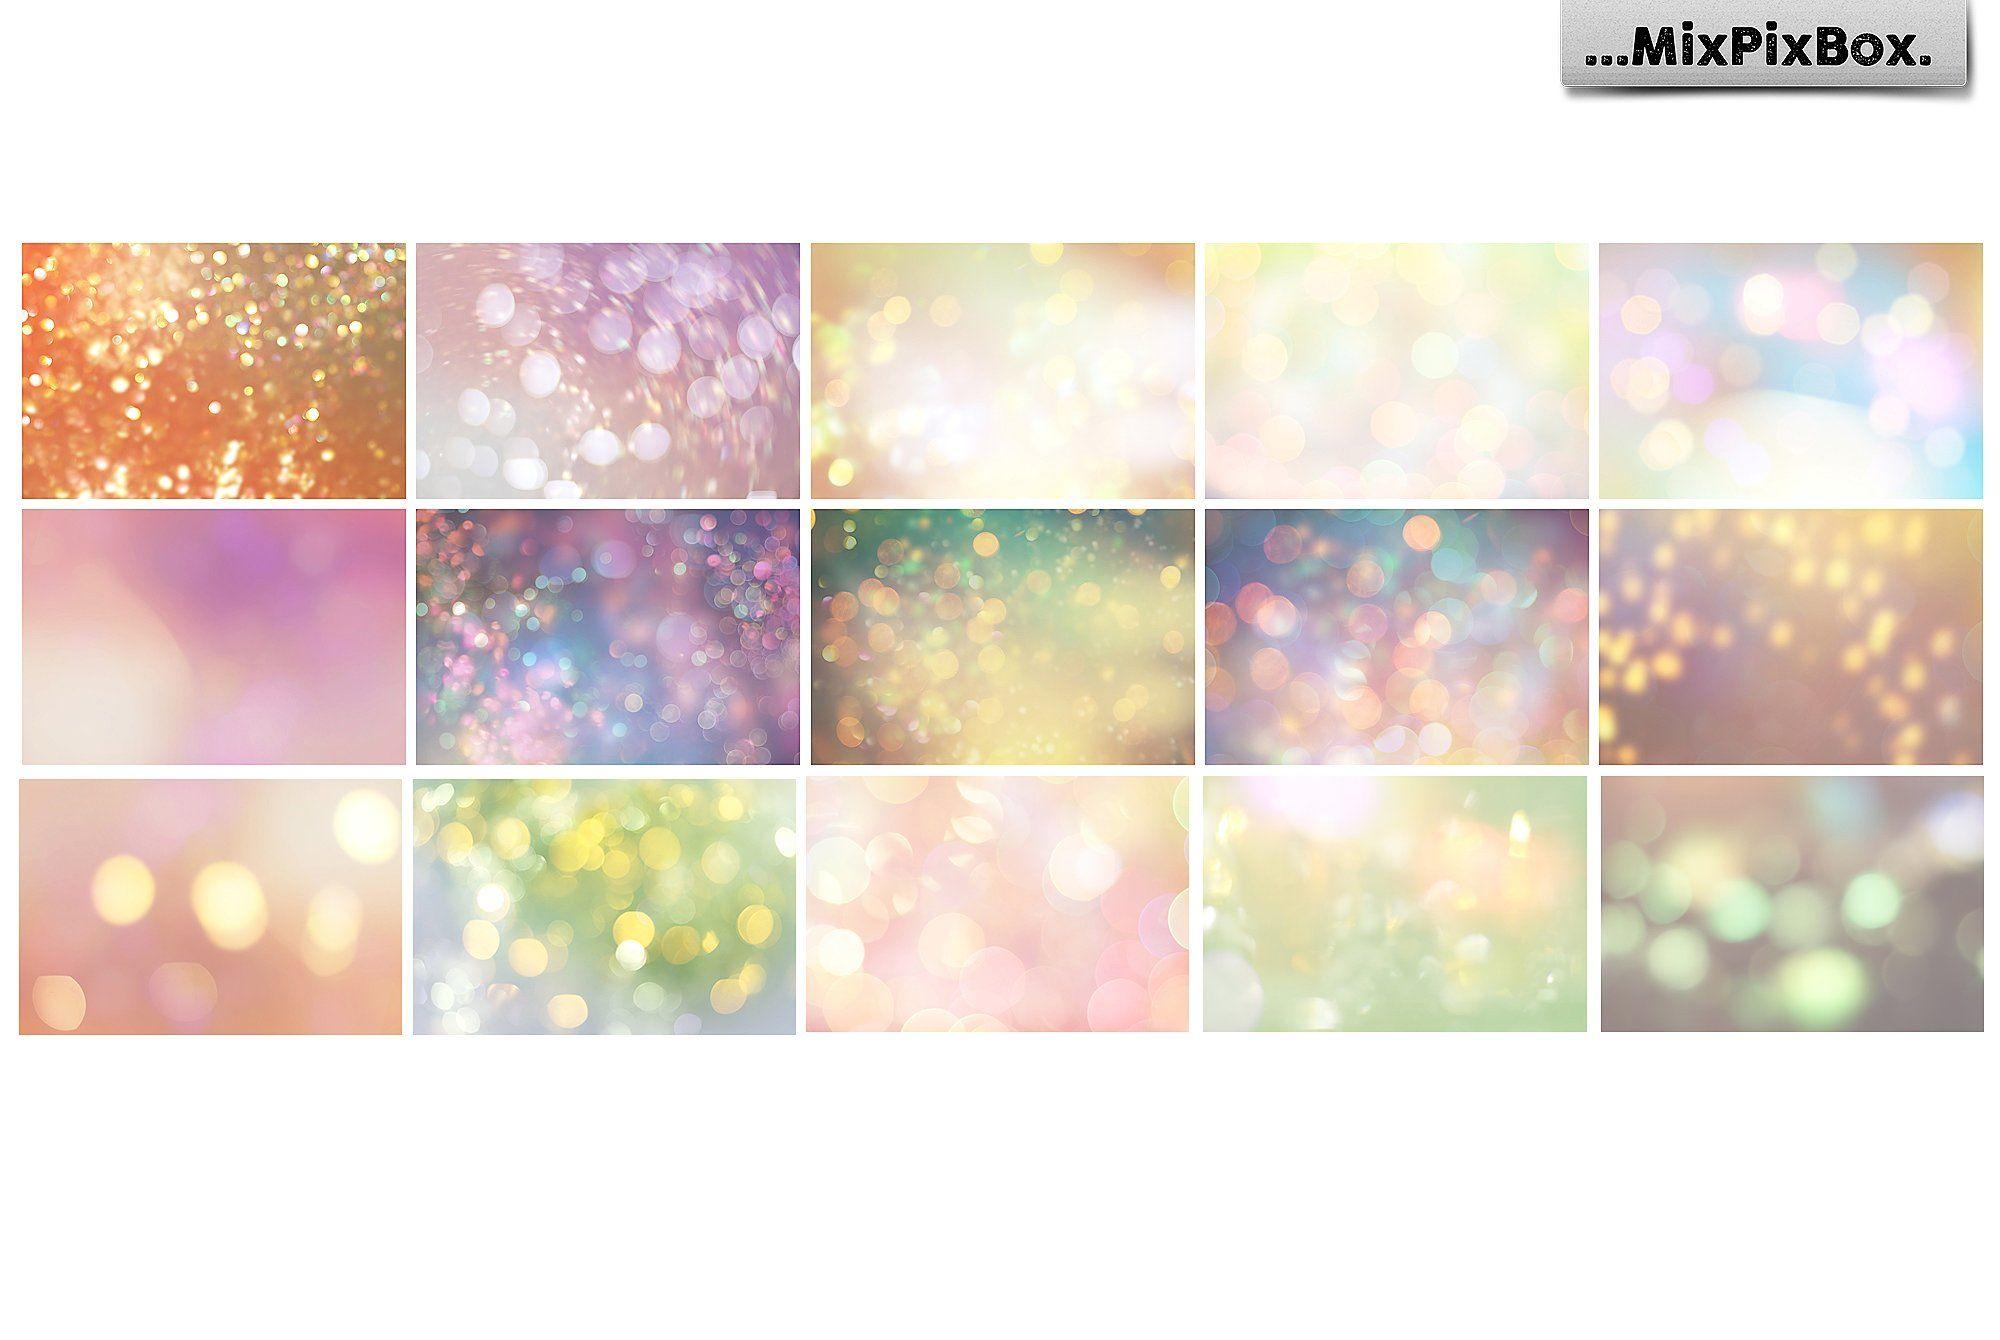 Summer Backdops Digital Backdrops Photo Overlays Photoshop Overlays